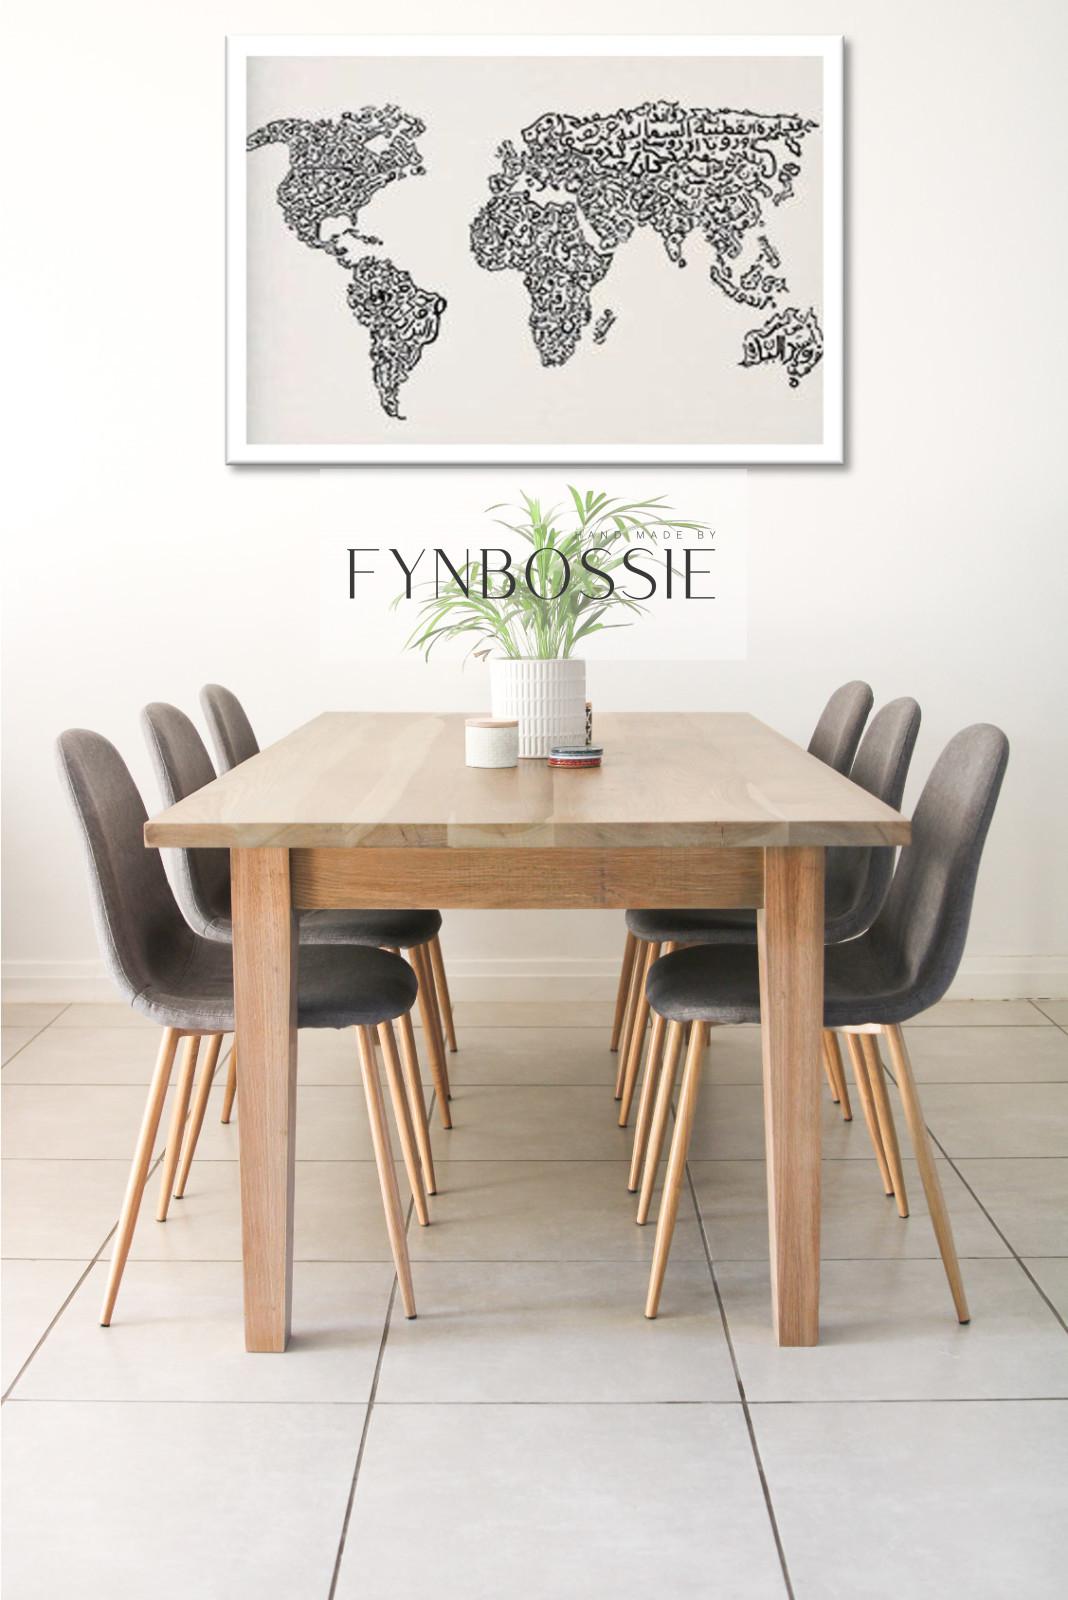 Euro oak dining table